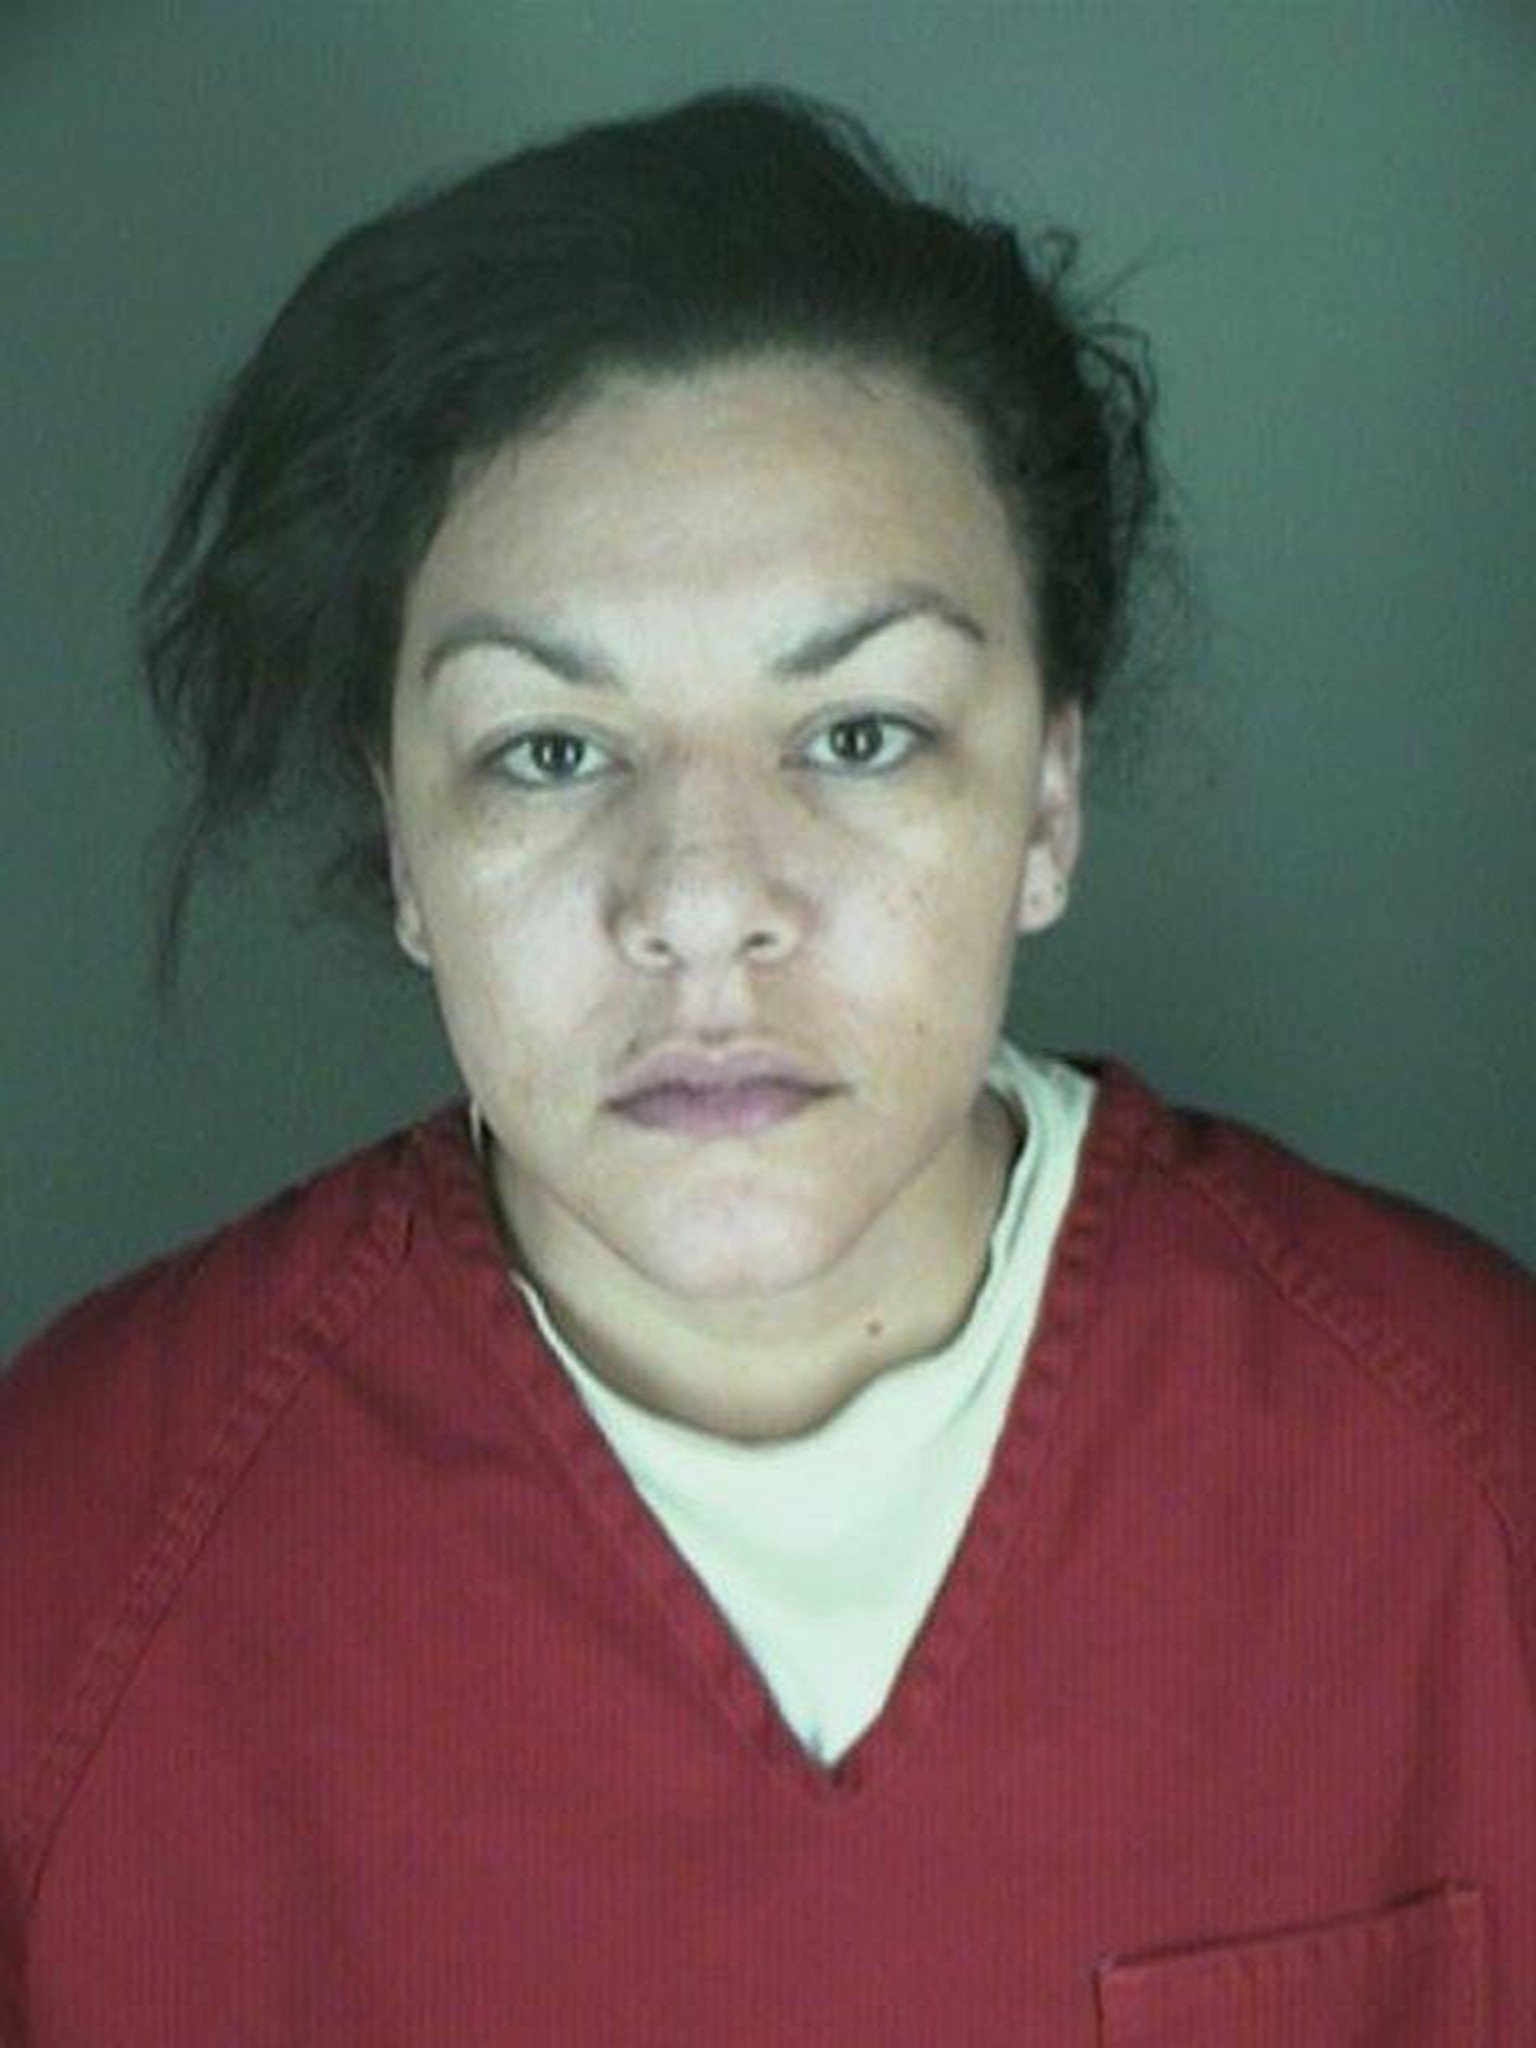 Woman on craigslist in wichita ks